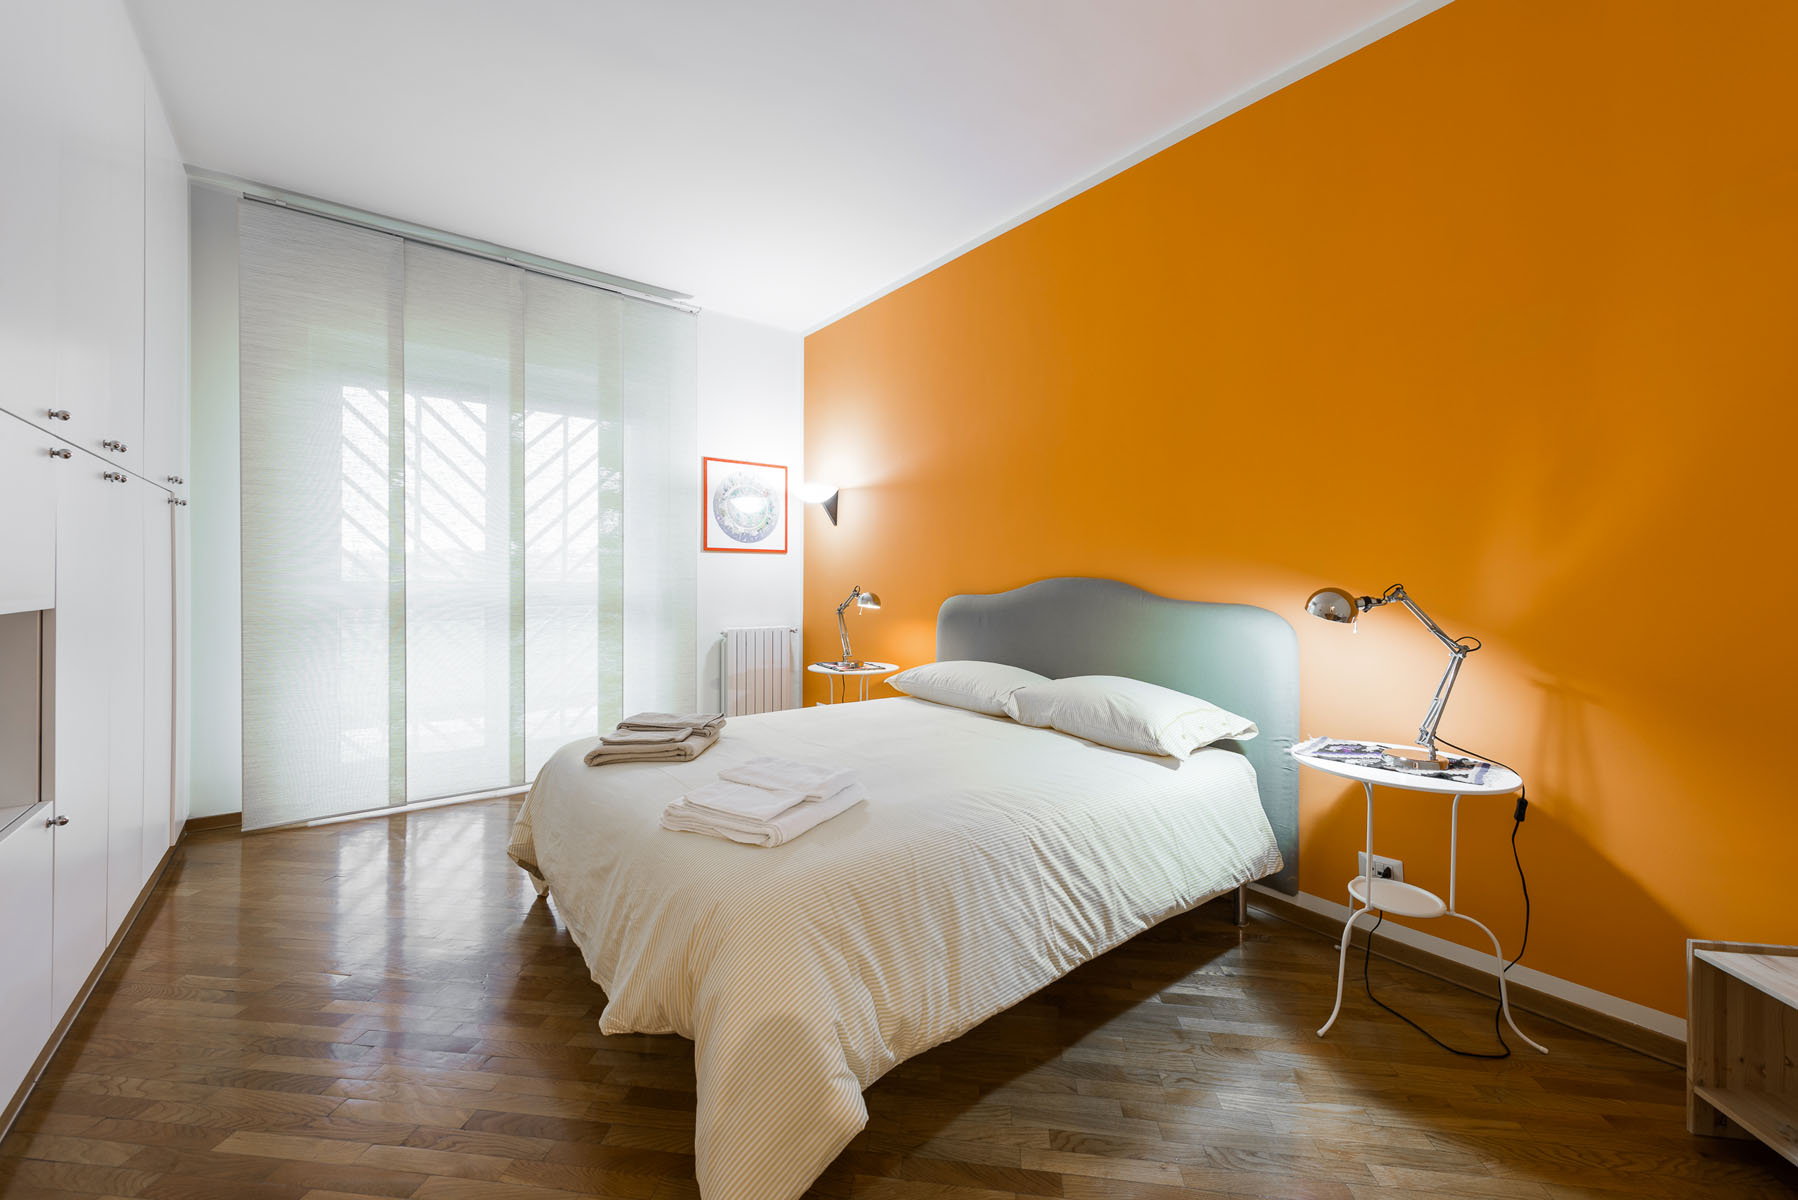 Arredamento bed and breakfast amazing salotto bed and for Ivan arredamenti